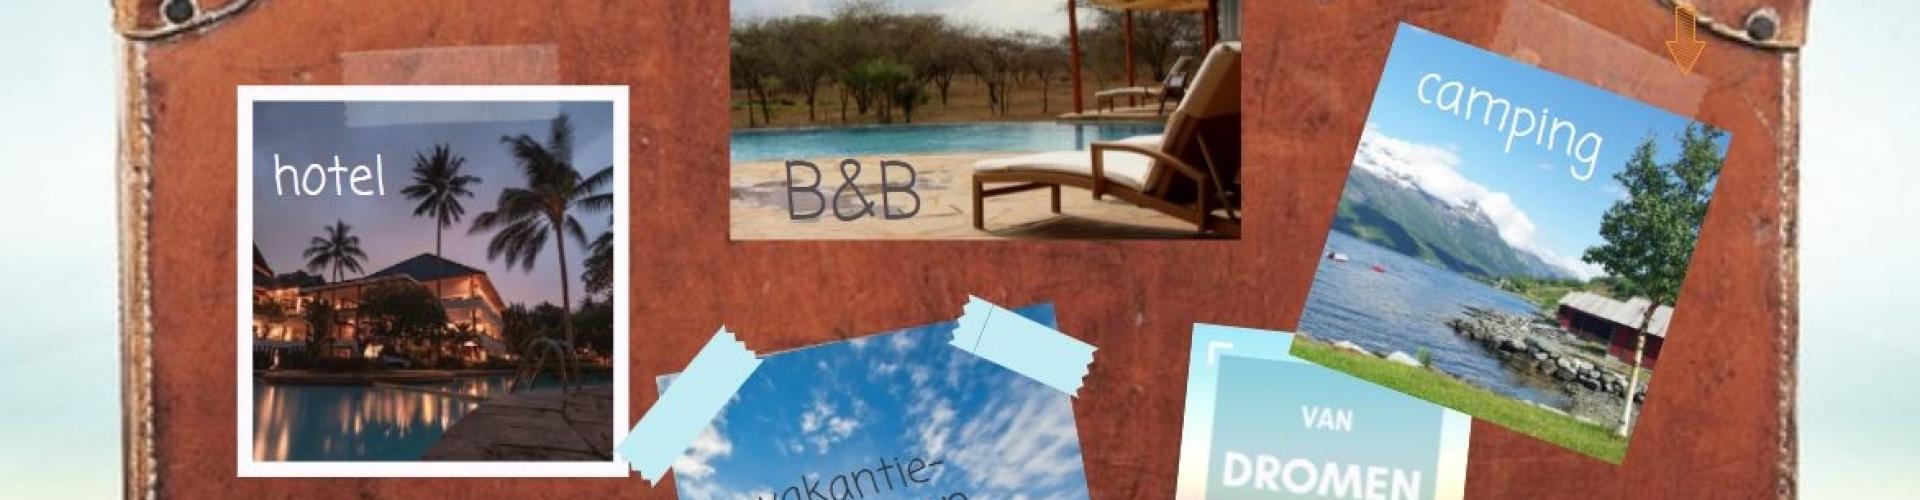 vertrekweek tips beginnen B&B hotel camping vakantiewoningen